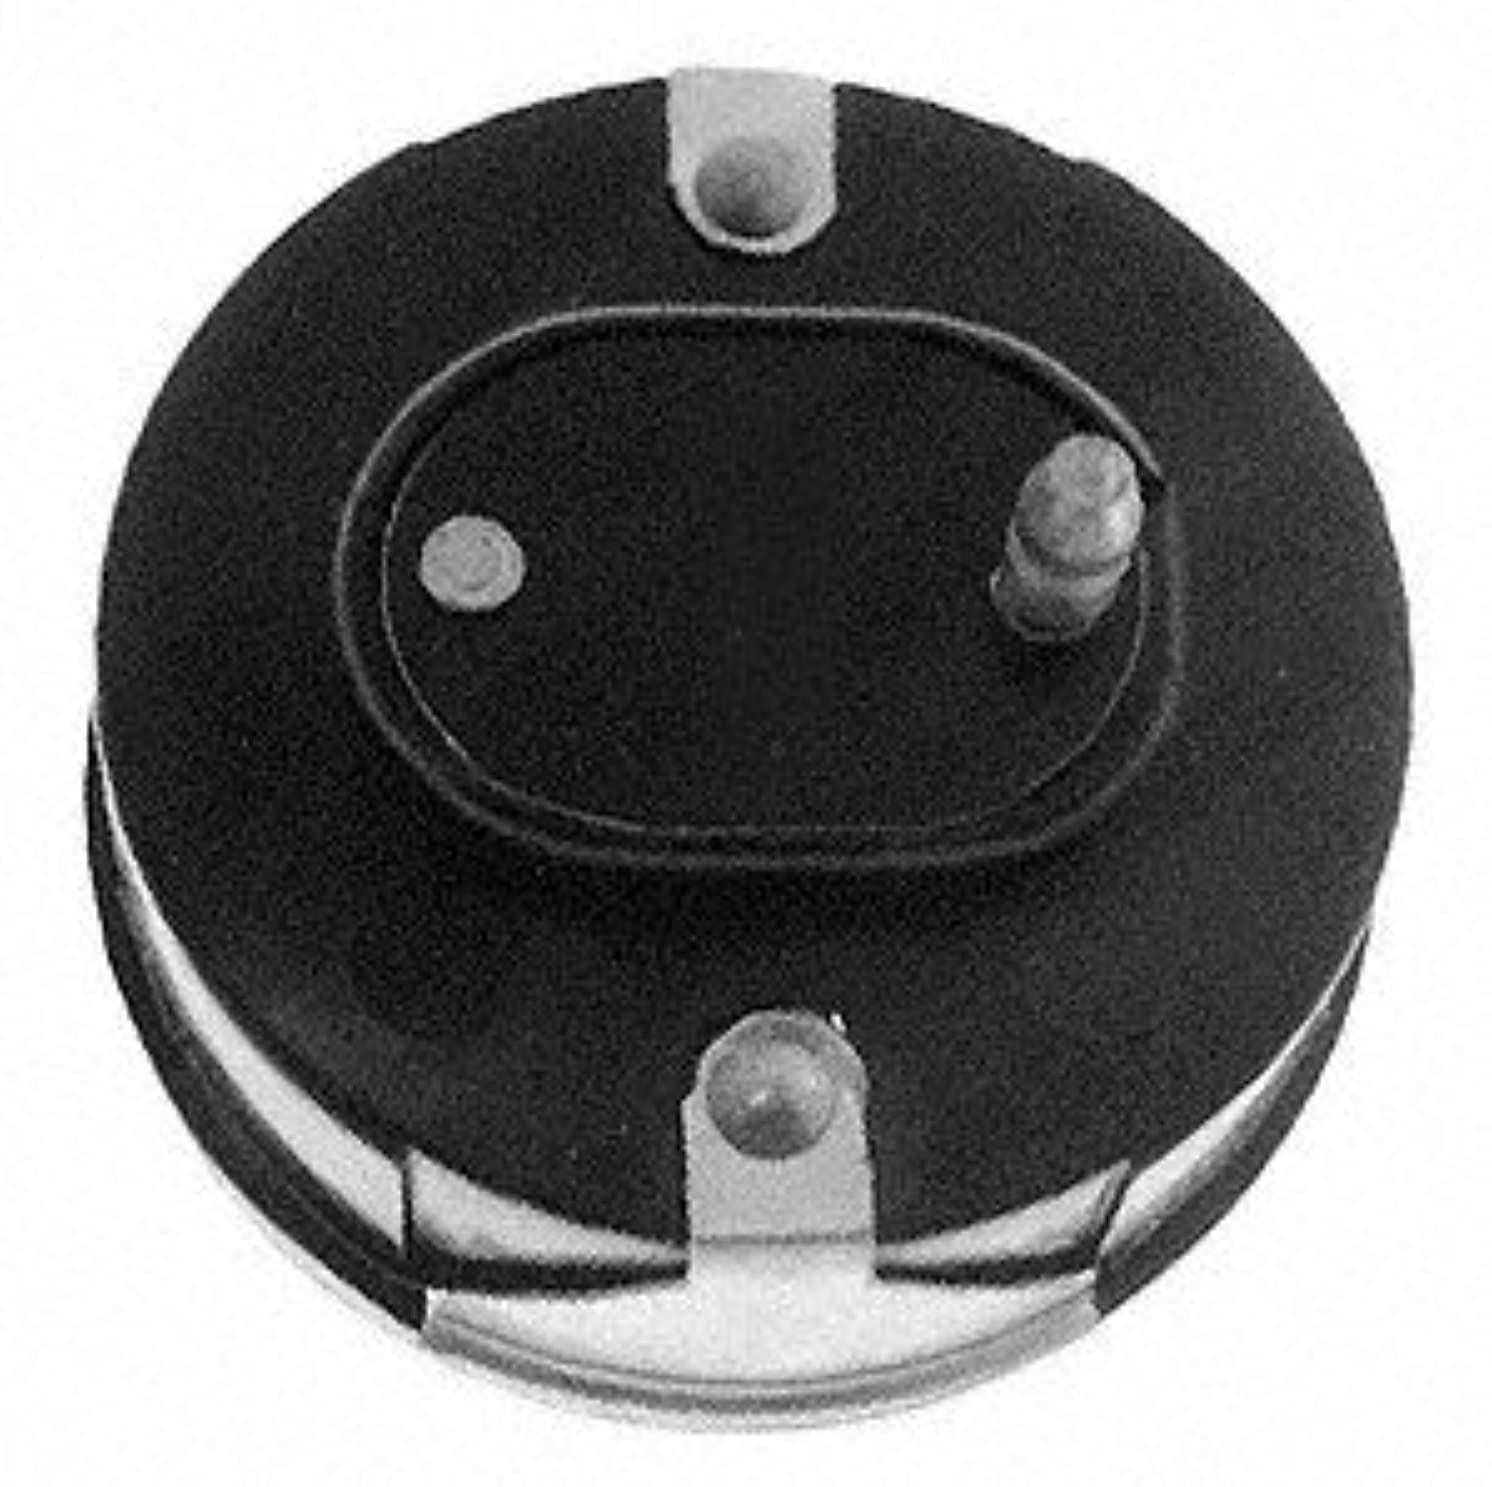 Standard Motor Products CV237 Choke Thermostat